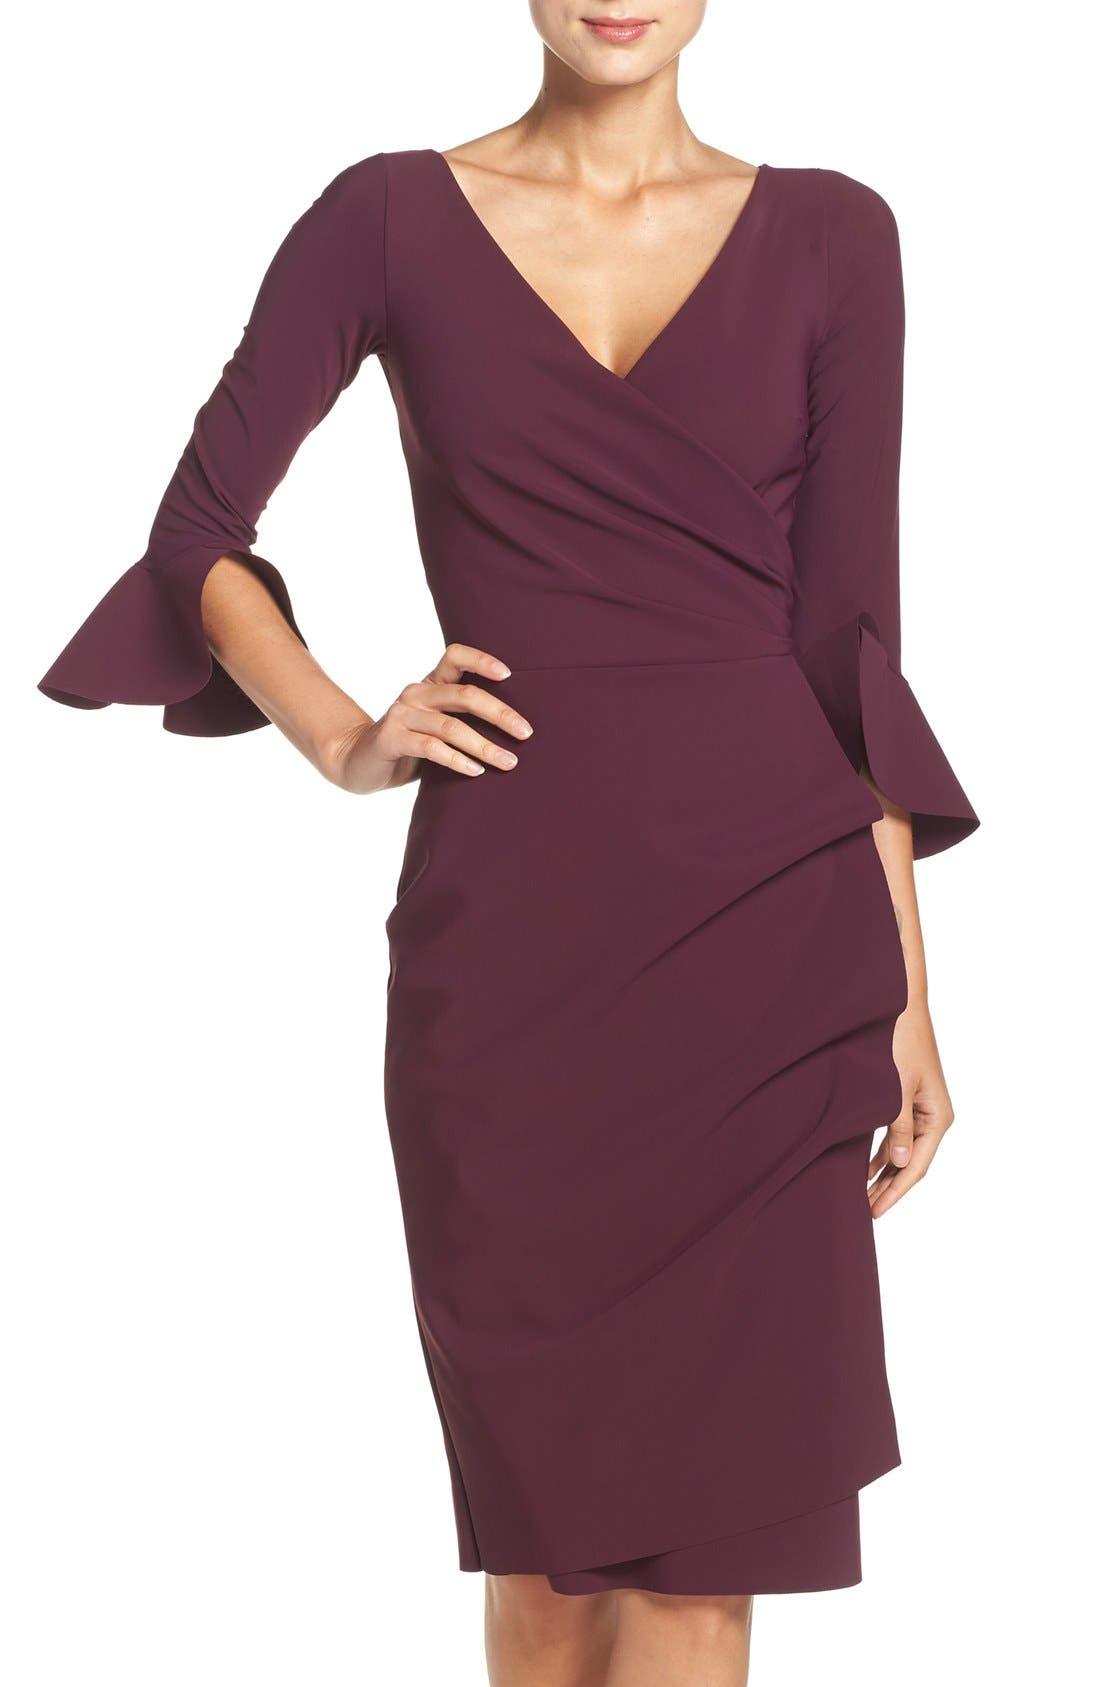 CHIARA BONI LA PETITE ROBE 'Triana' Jersey Sheath Dress, Main, color, 501